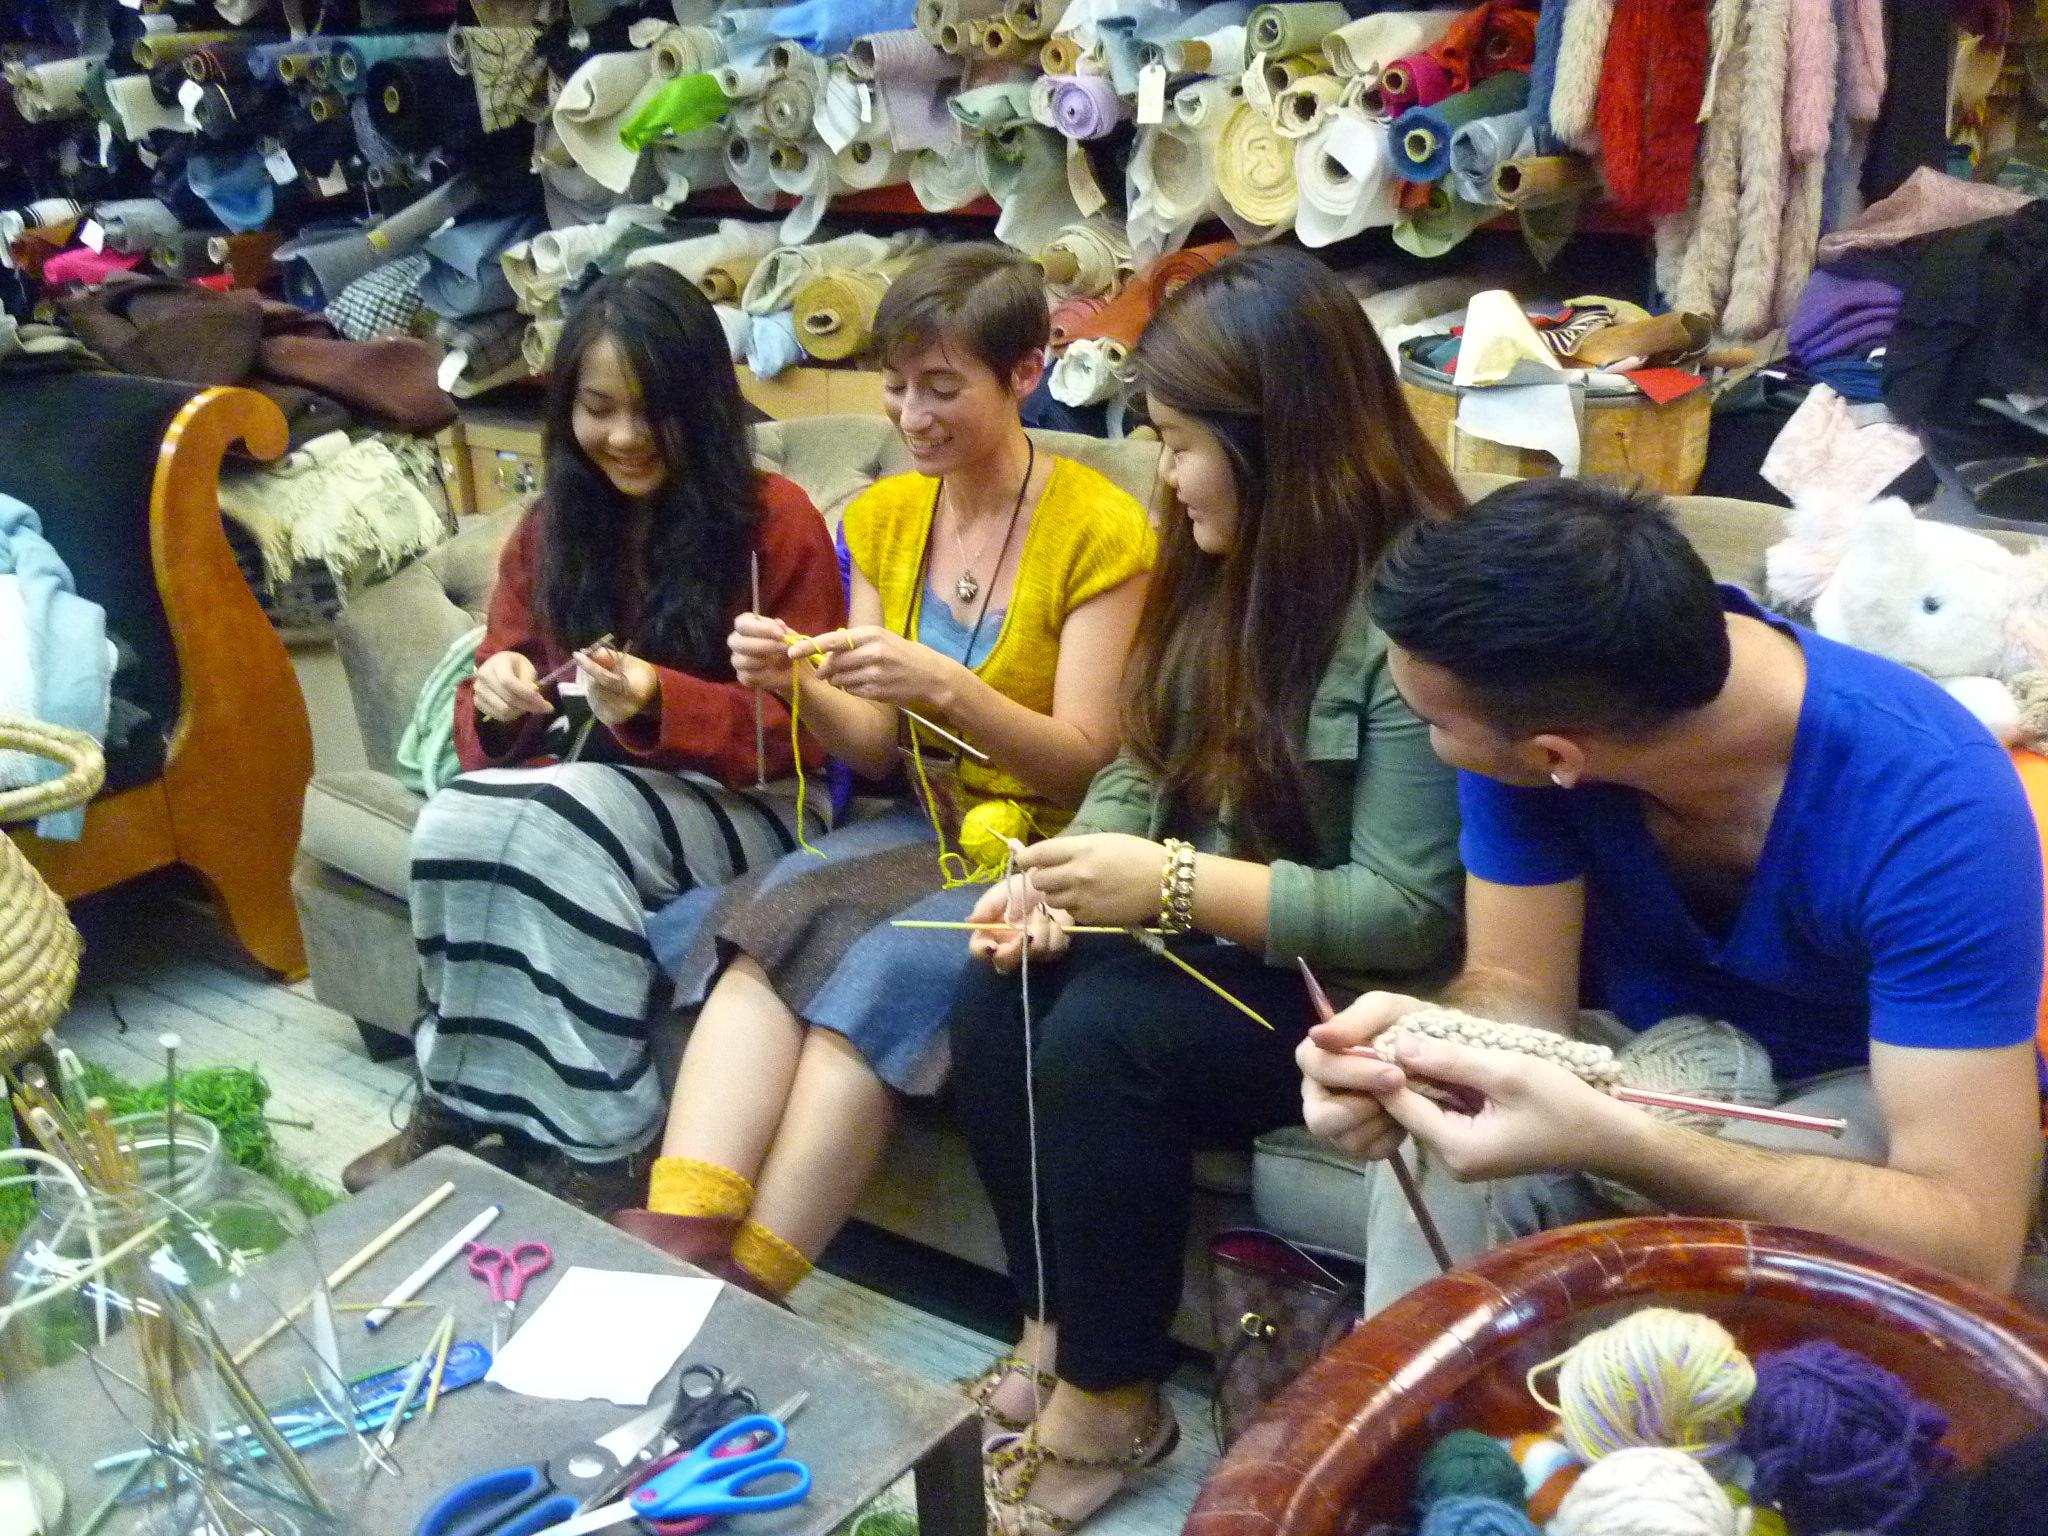 knitting-help_6233338417_o.jpg